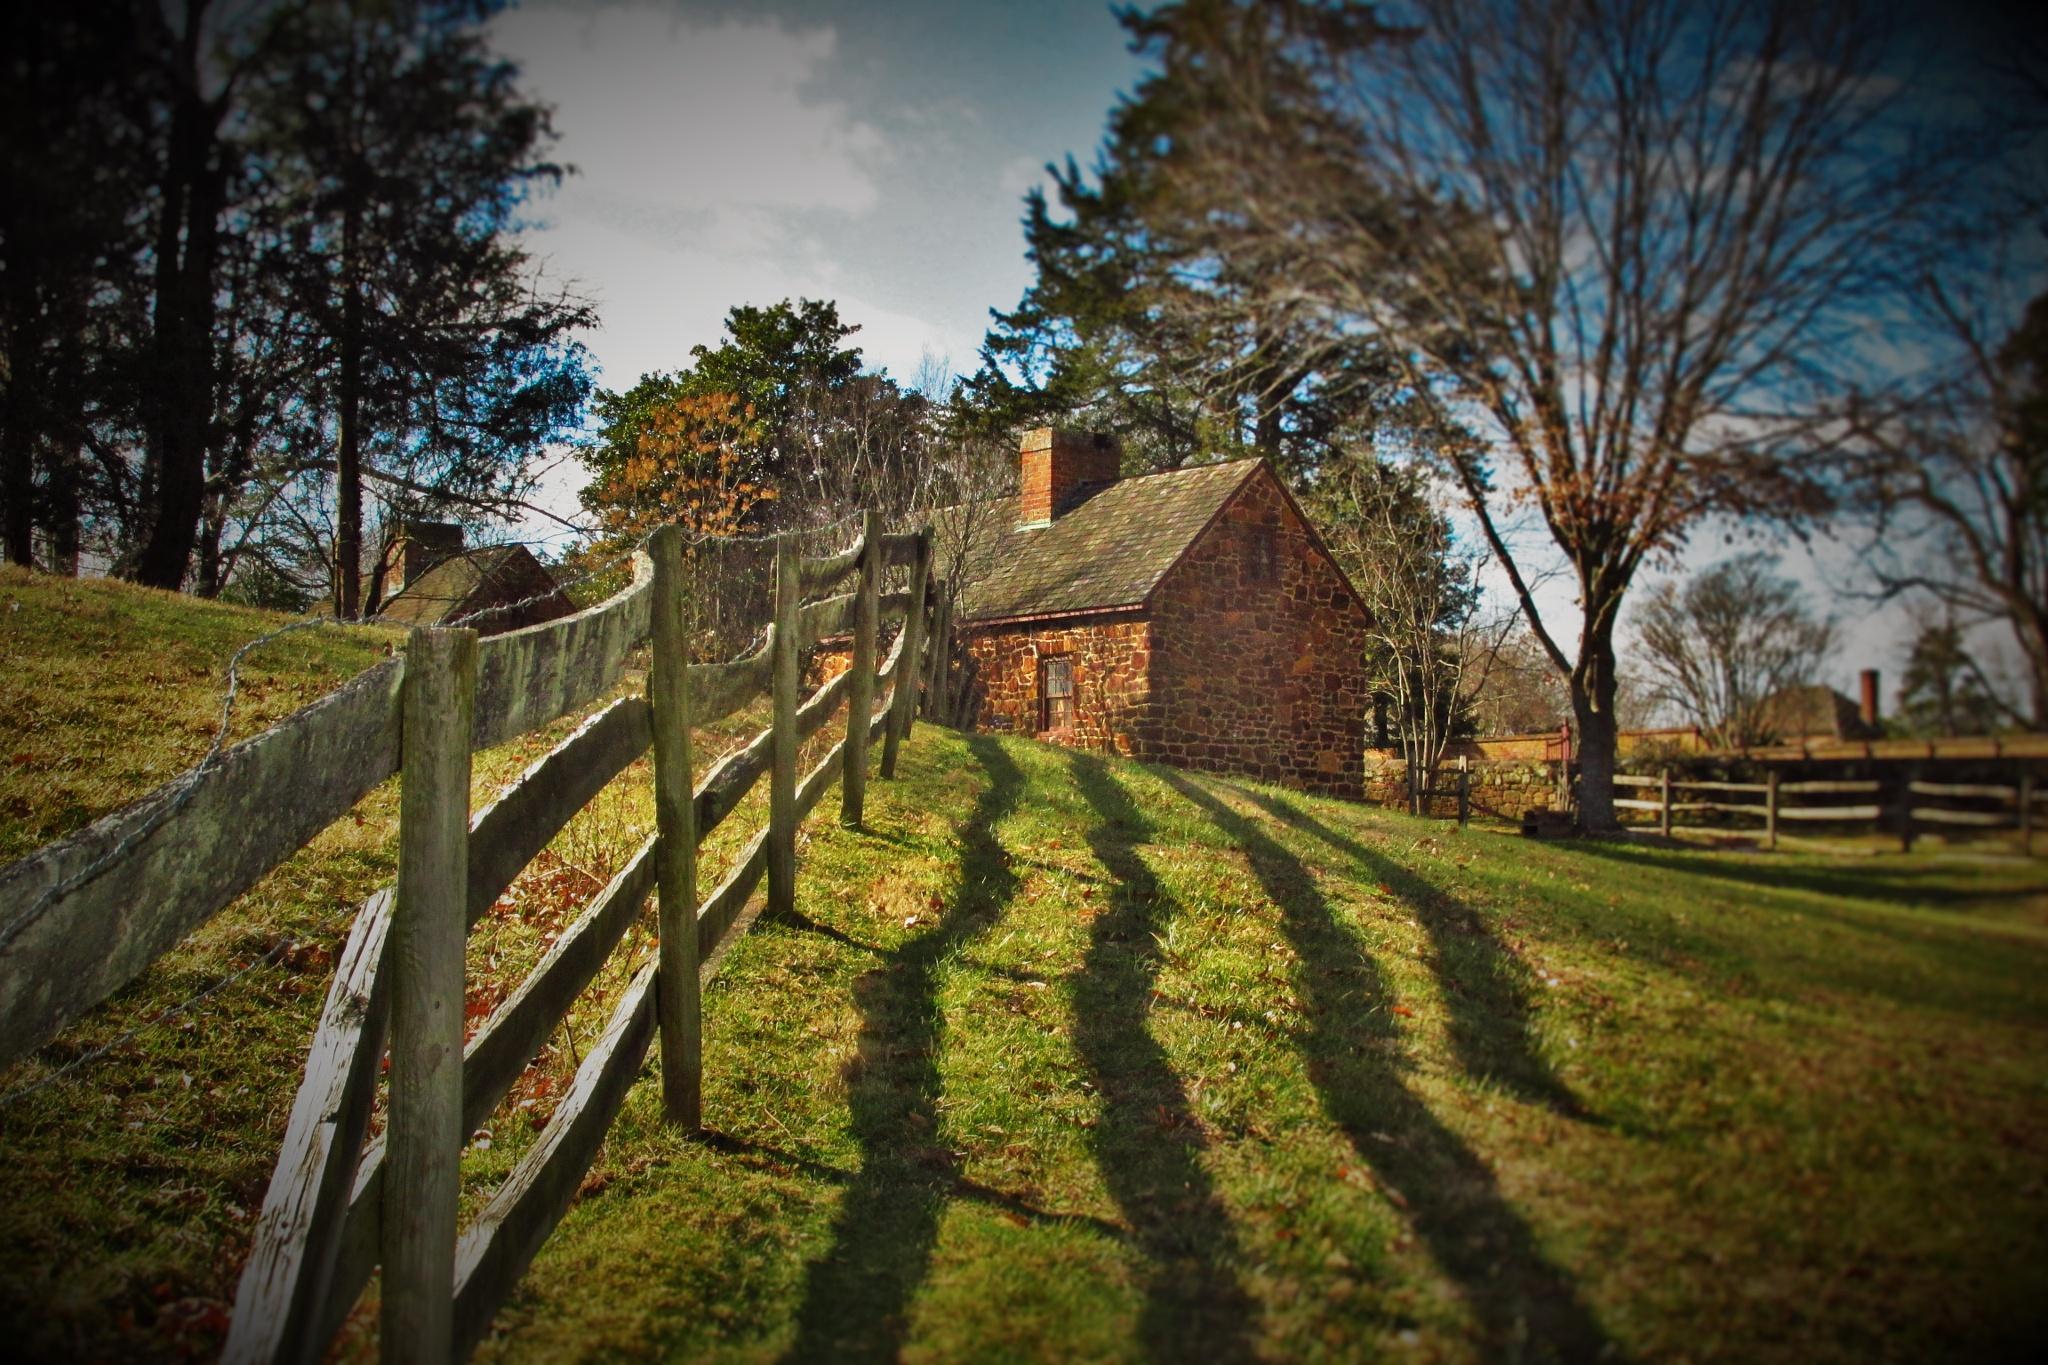 Follow The Fence by brant.stevenson